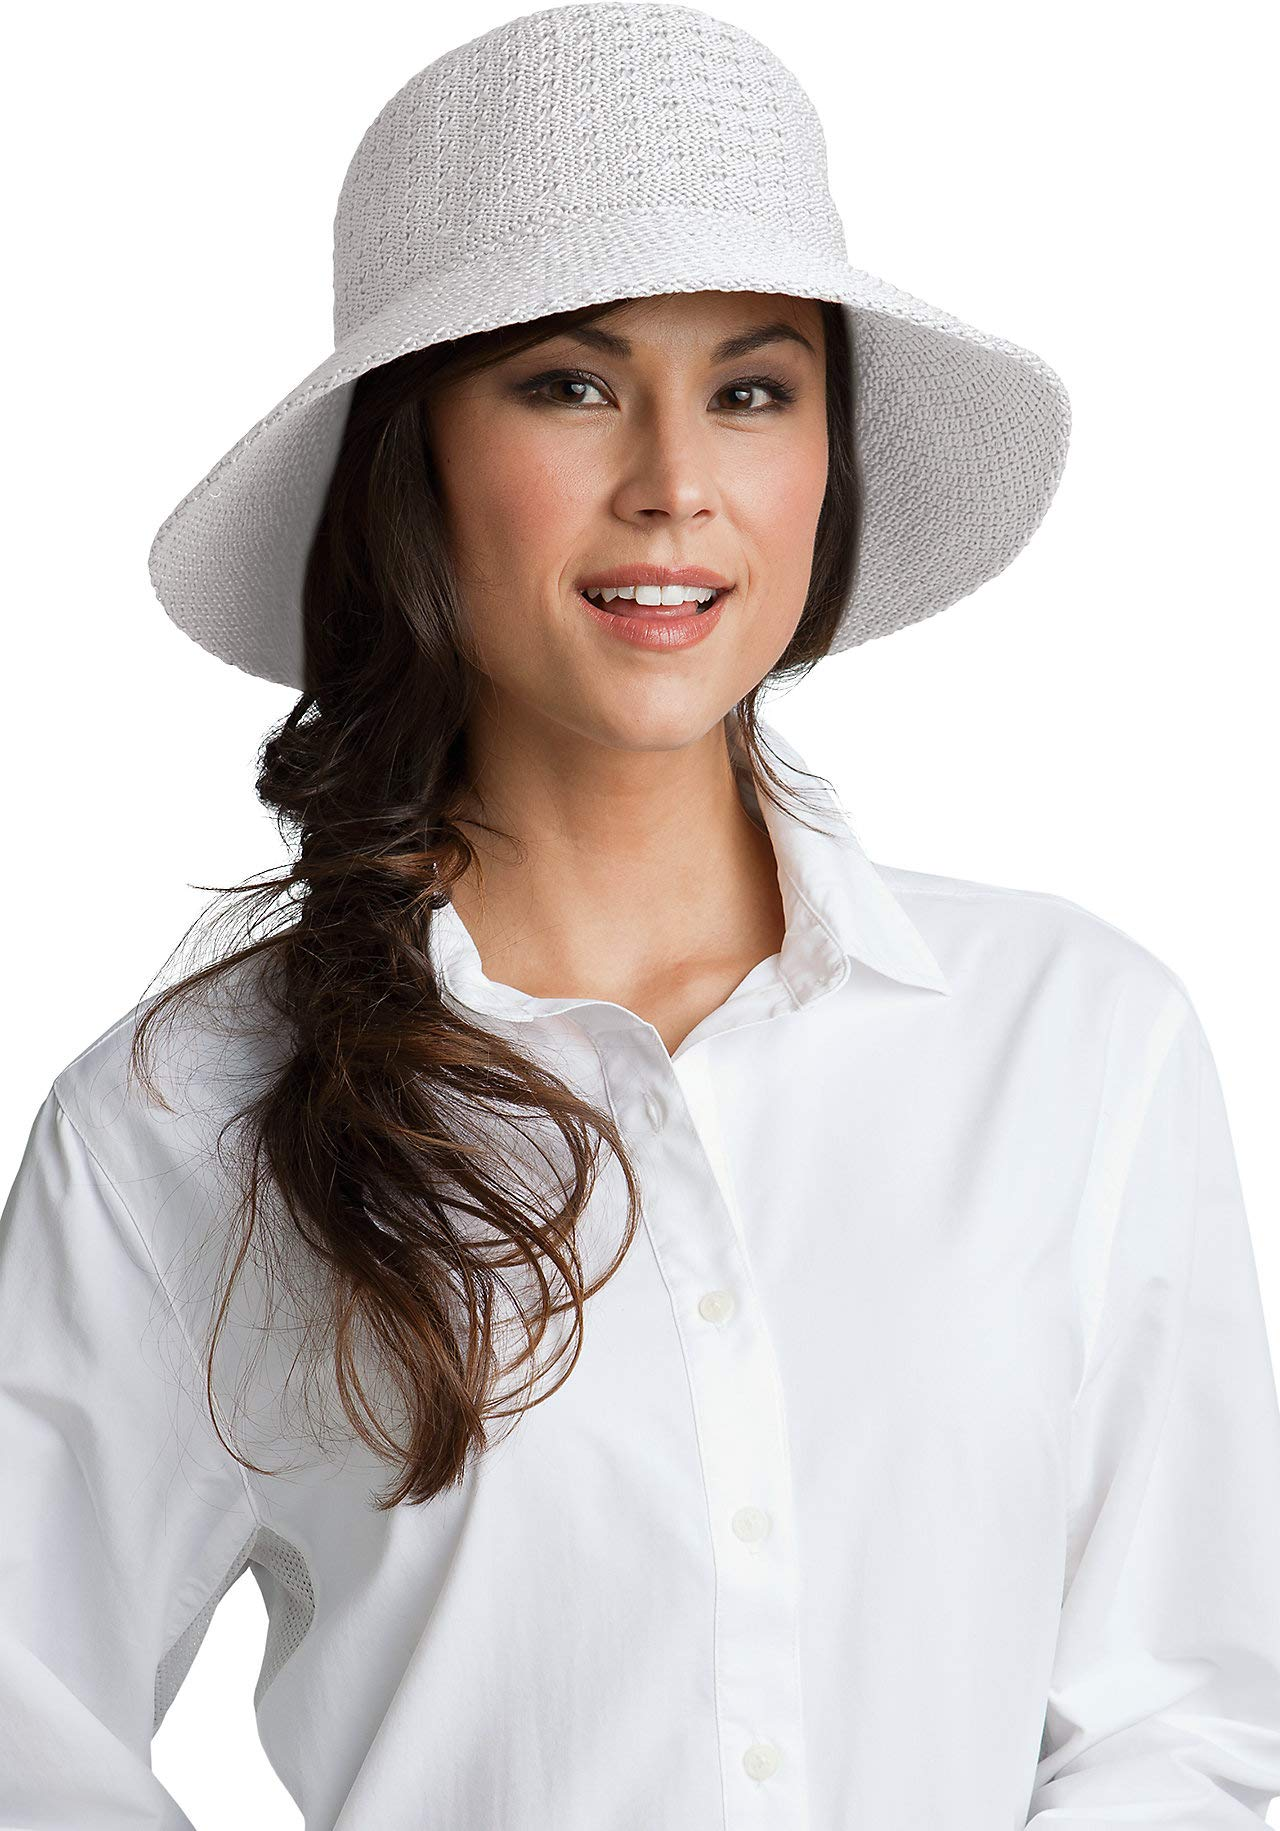 39725e8084d77 Details about Coolibar UPF 50+ Women s Marina Sun Hat - Sun Protective (One  Size- White)